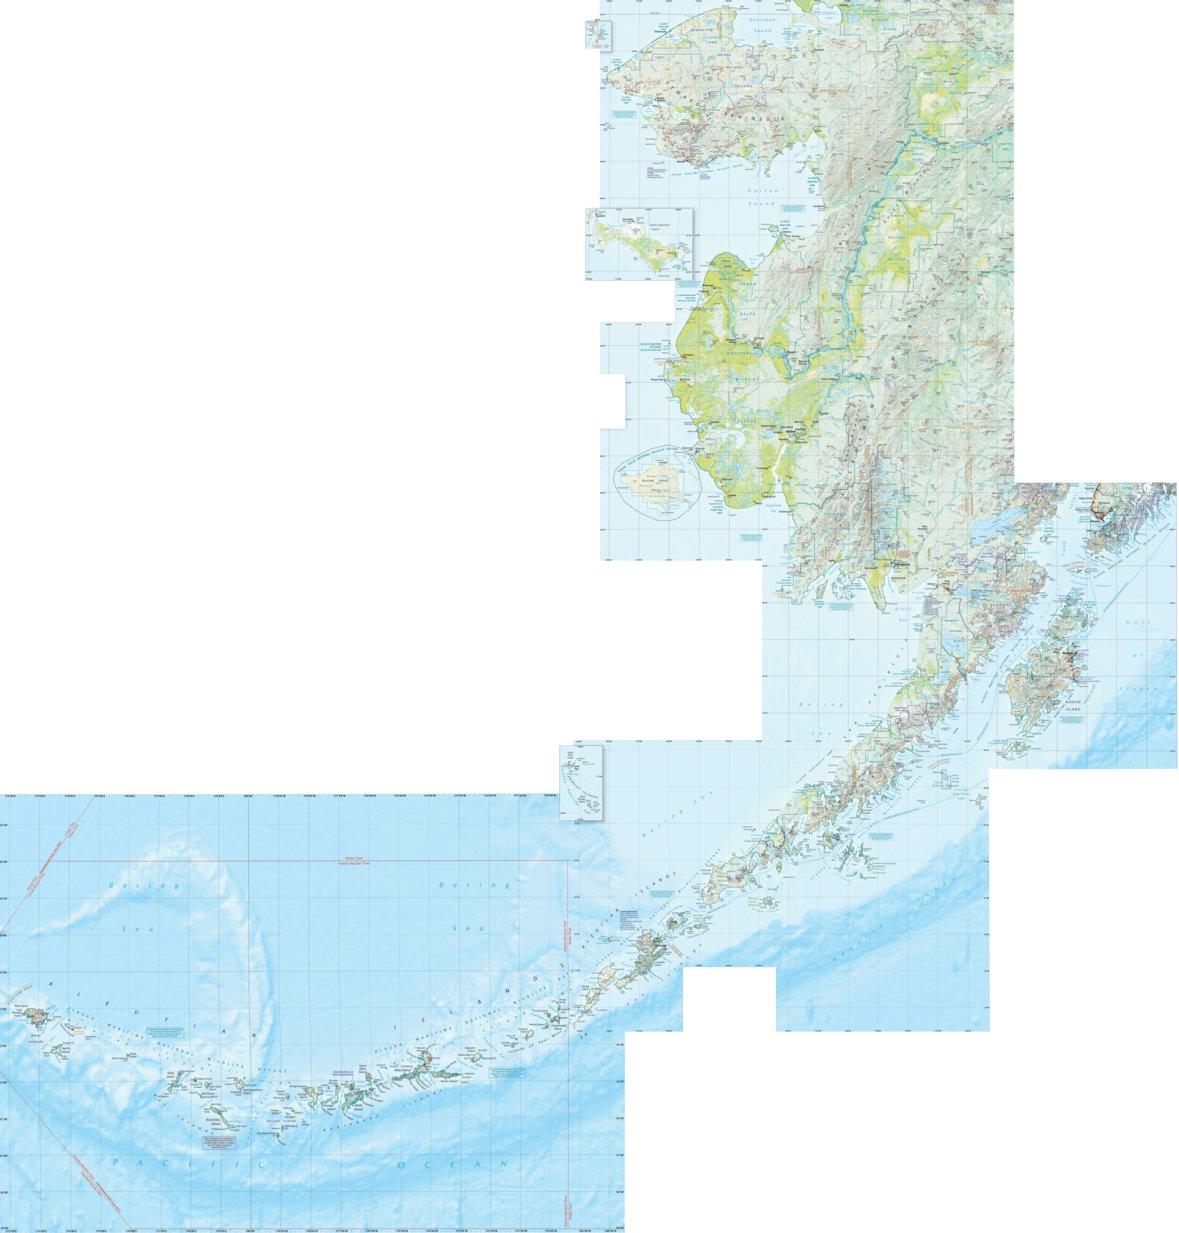 Alaska Atlas Southwest Landscape Maps Benchmark Maps Avenza Maps